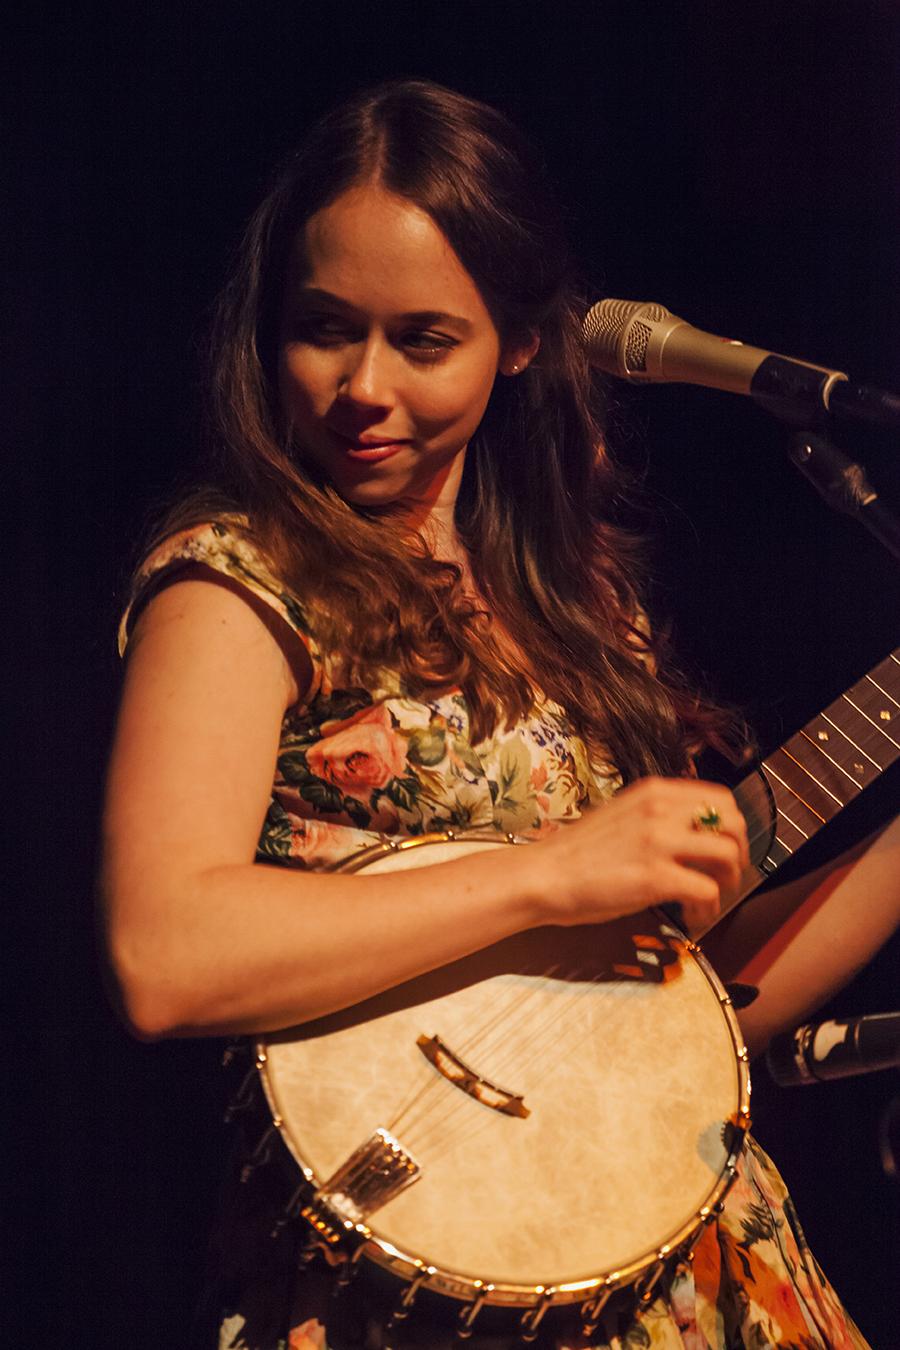 Sarah Jarosz at Mississippi Studios, Portland, Oregon, 2011. photo by Hermon joyner.